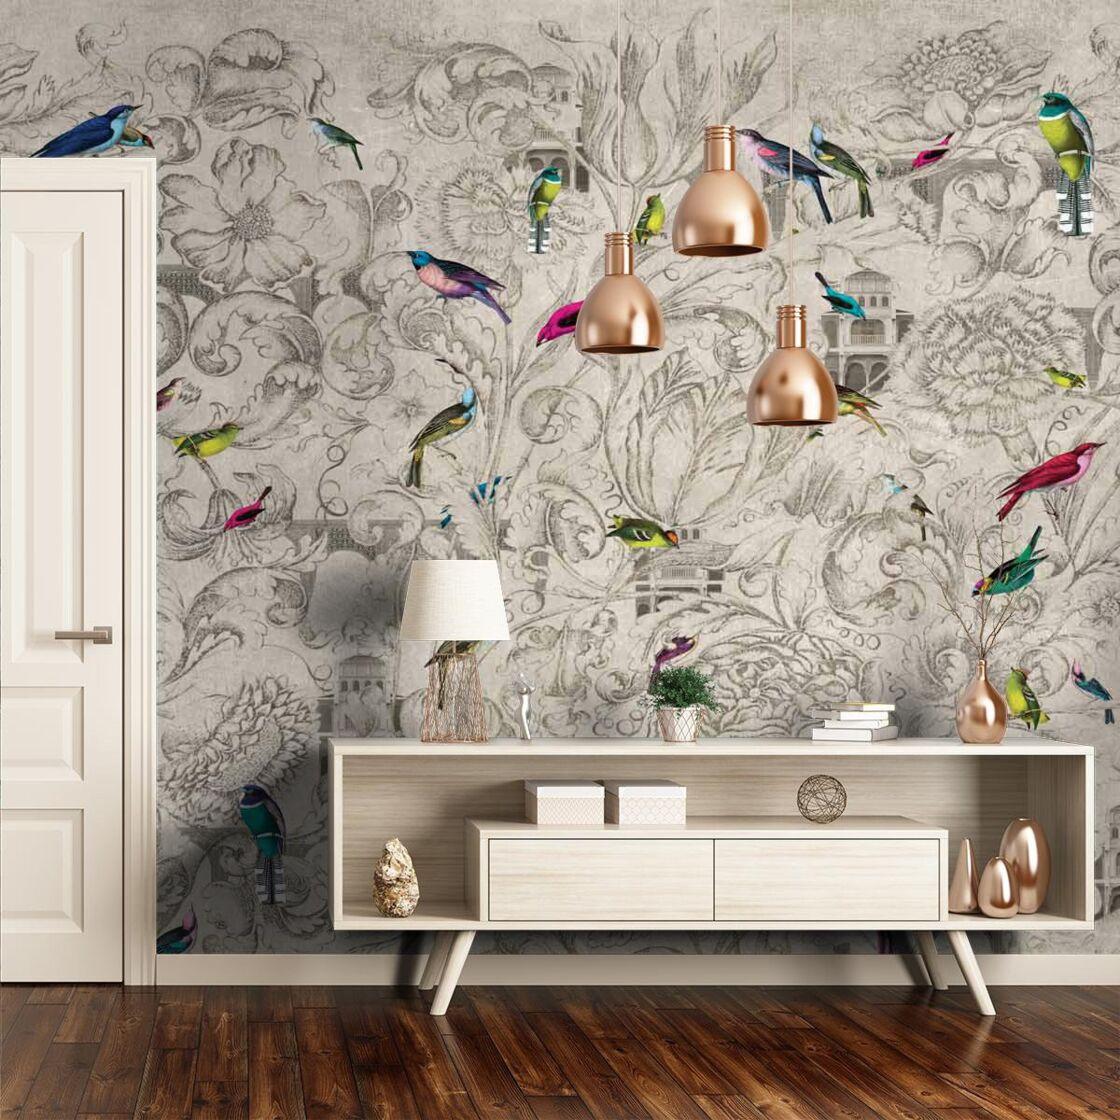 Idee Tapisserie Salle A Manger papier peint panoramique : comment l'adopter ? : femme